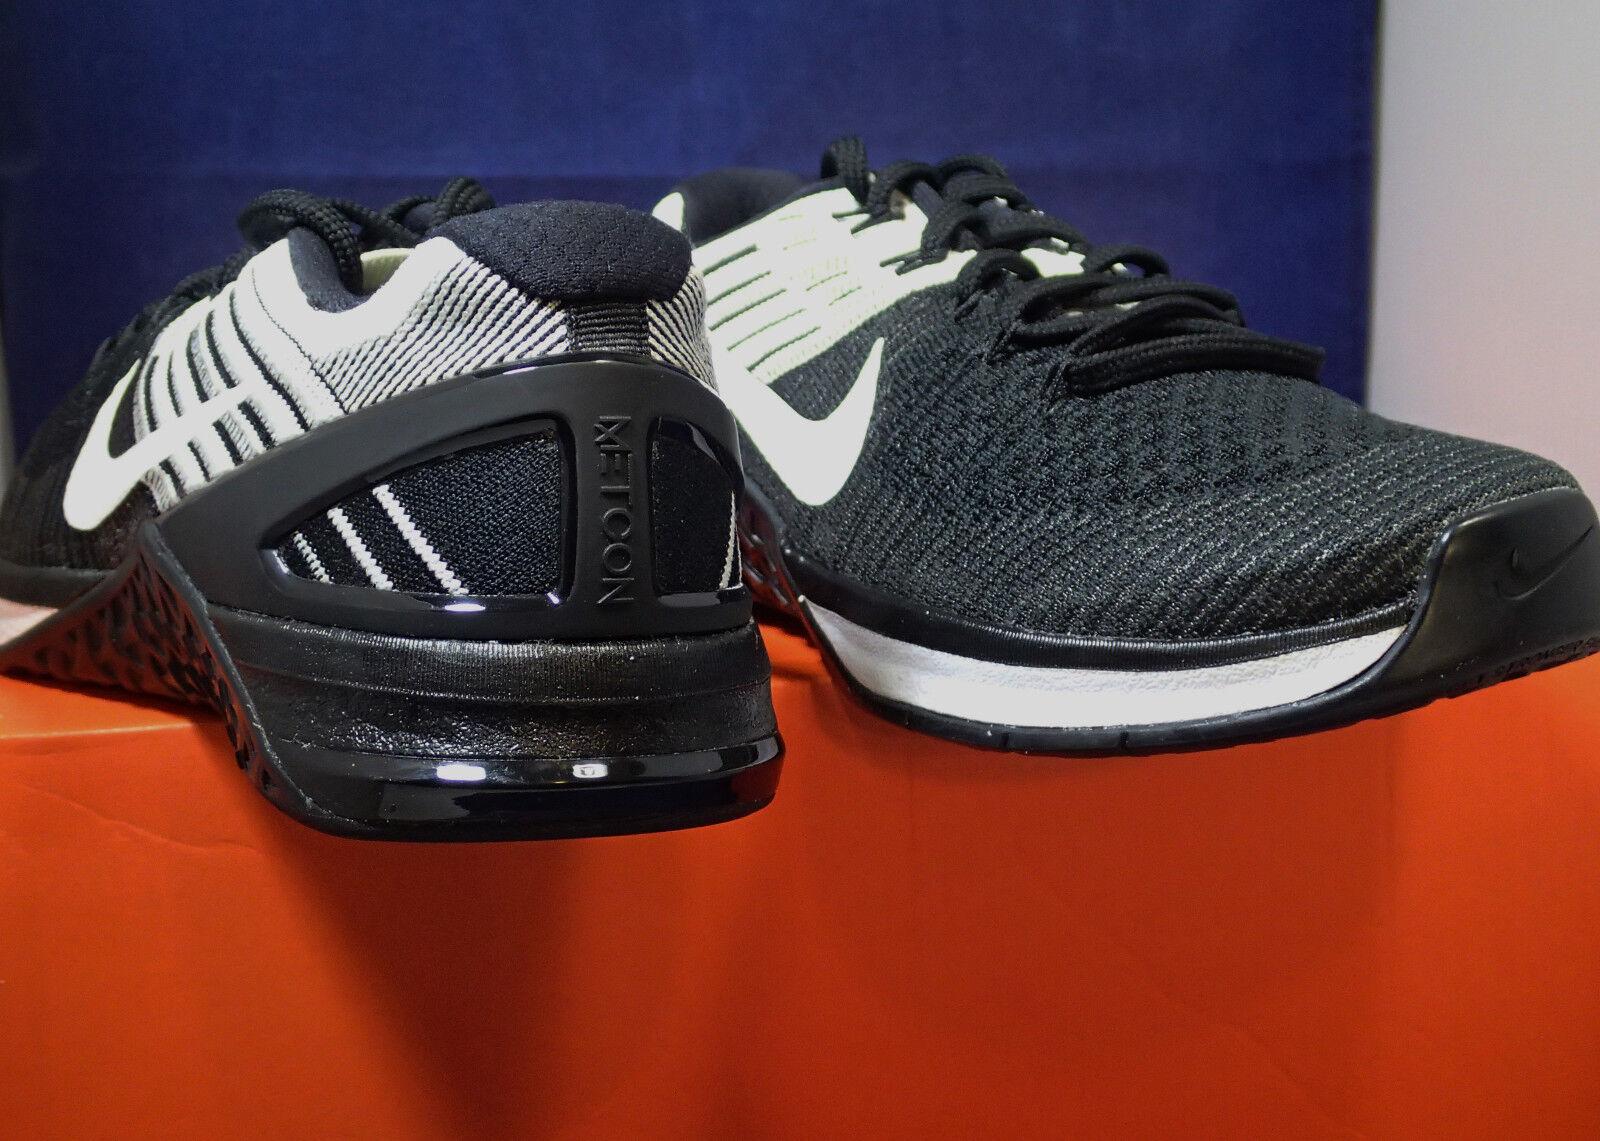 Mujeres Nike Metcon 3 DSX Flyknit Negro Negro Negro Blanco Crossfit (849809001) 2d8e7d